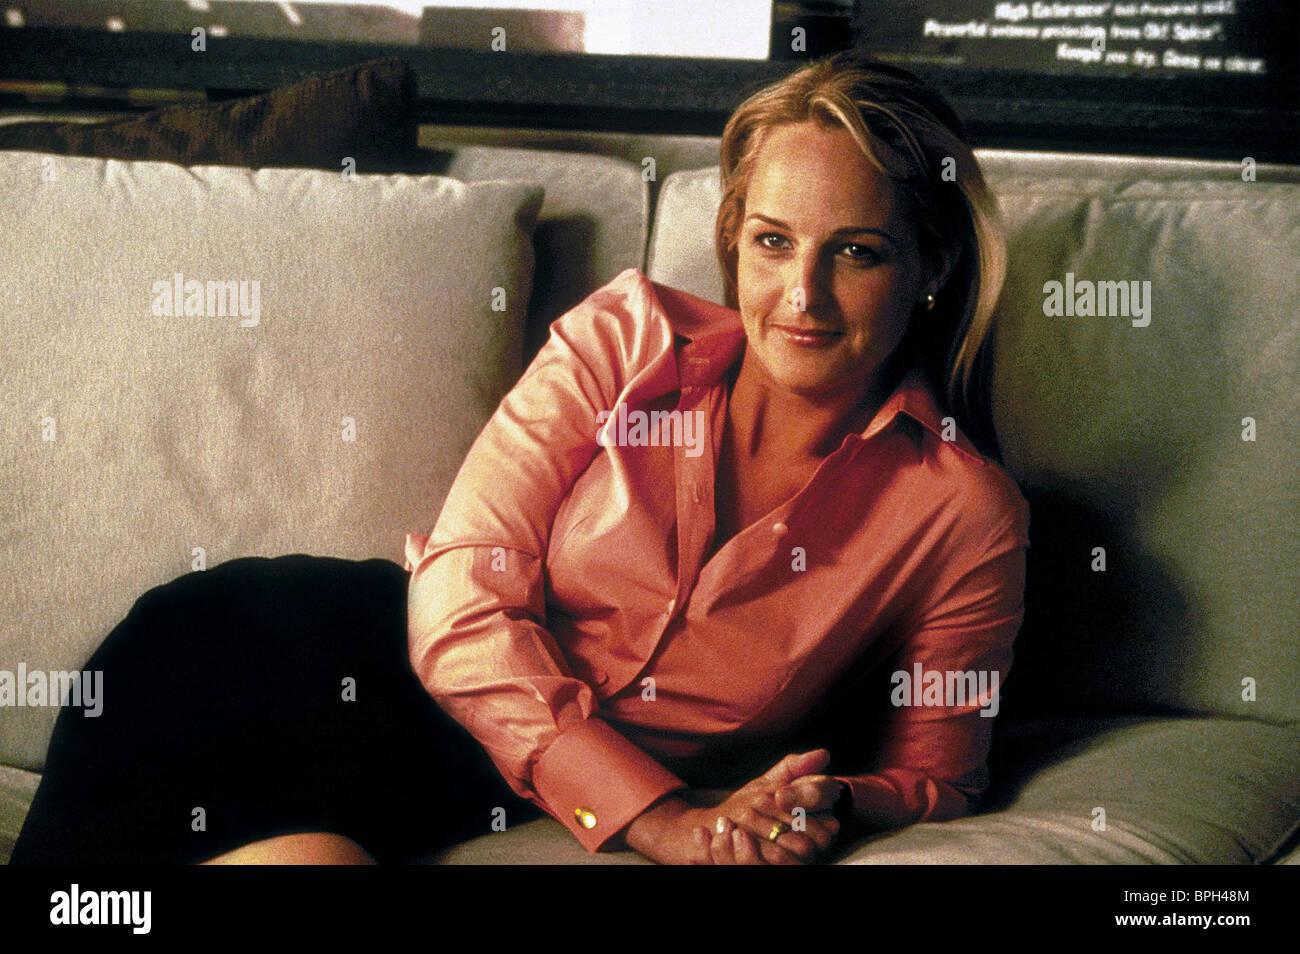 Helen Hunt Stock Photos & Helen Hunt Stock Images - AlamyHelen Hunt What Women Want